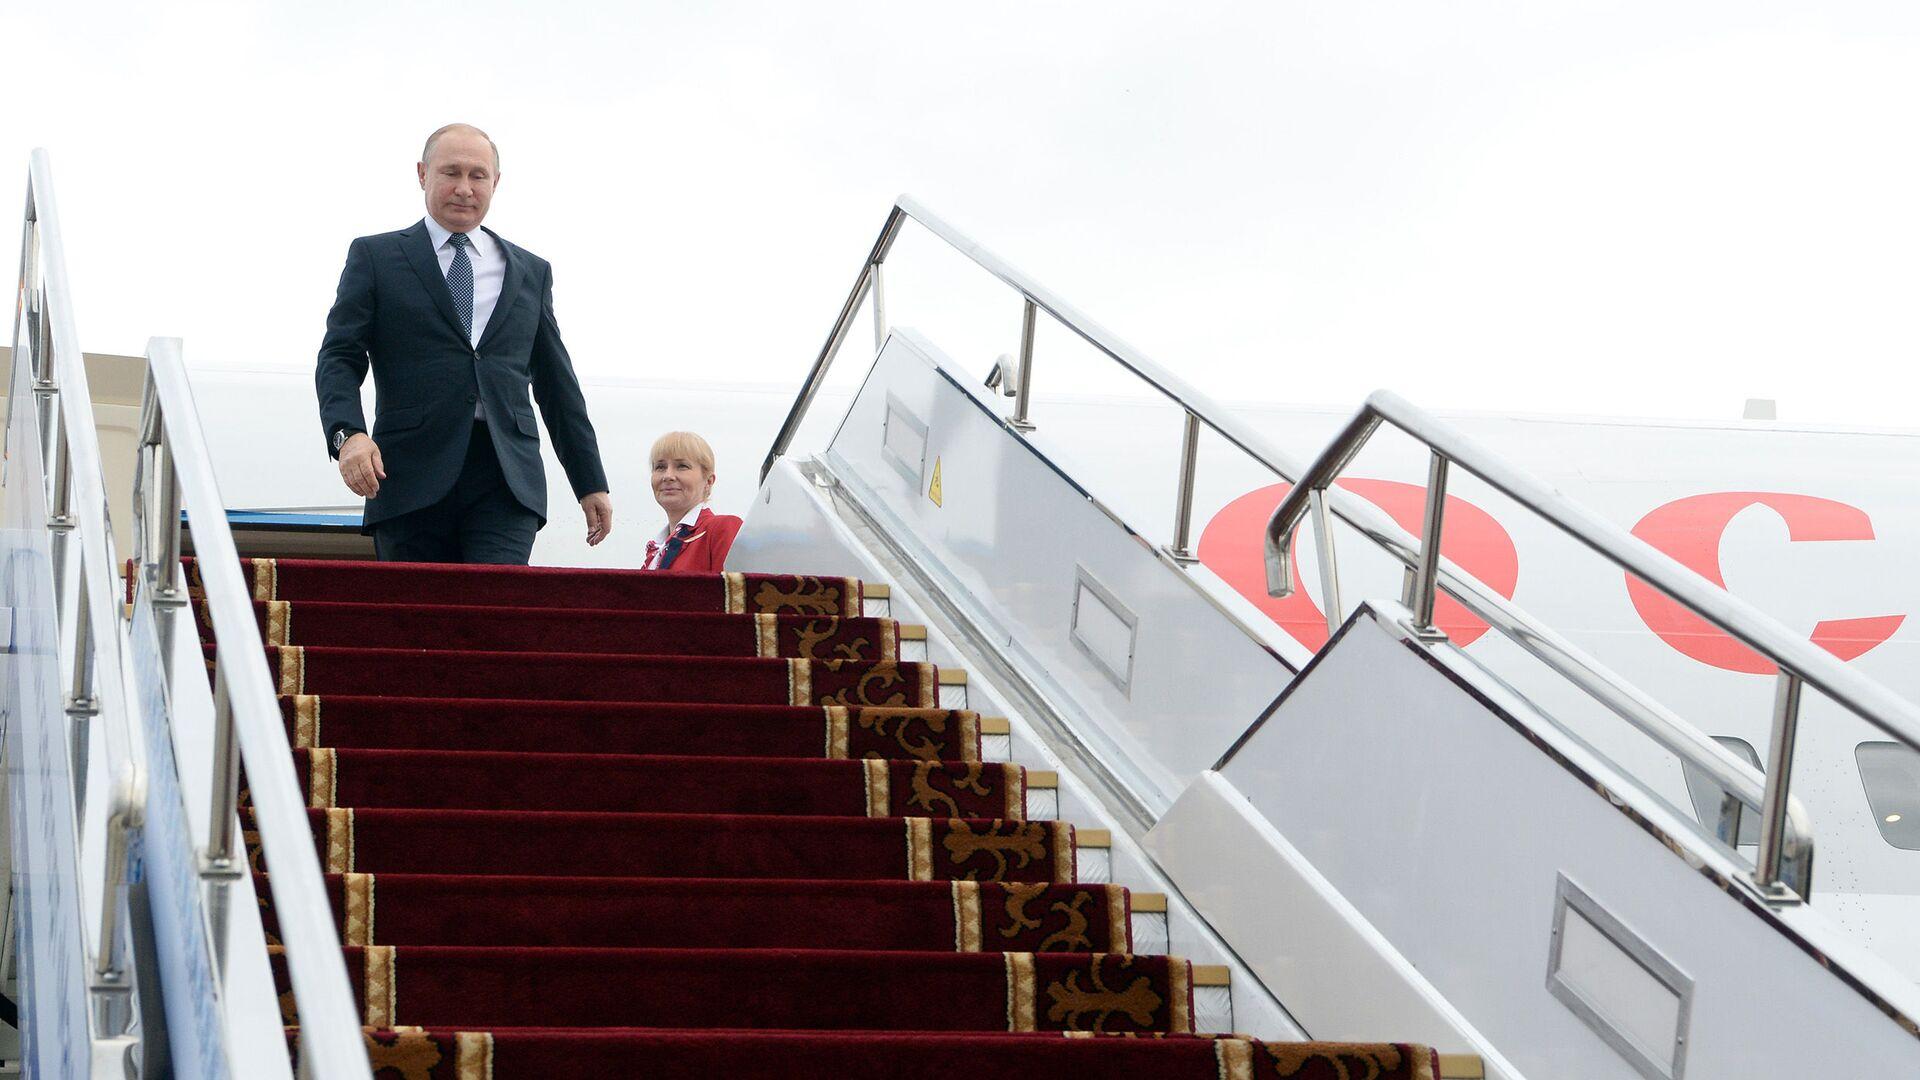 Президент России Владимир Путин - Sputnik Таджикистан, 1920, 13.09.2021